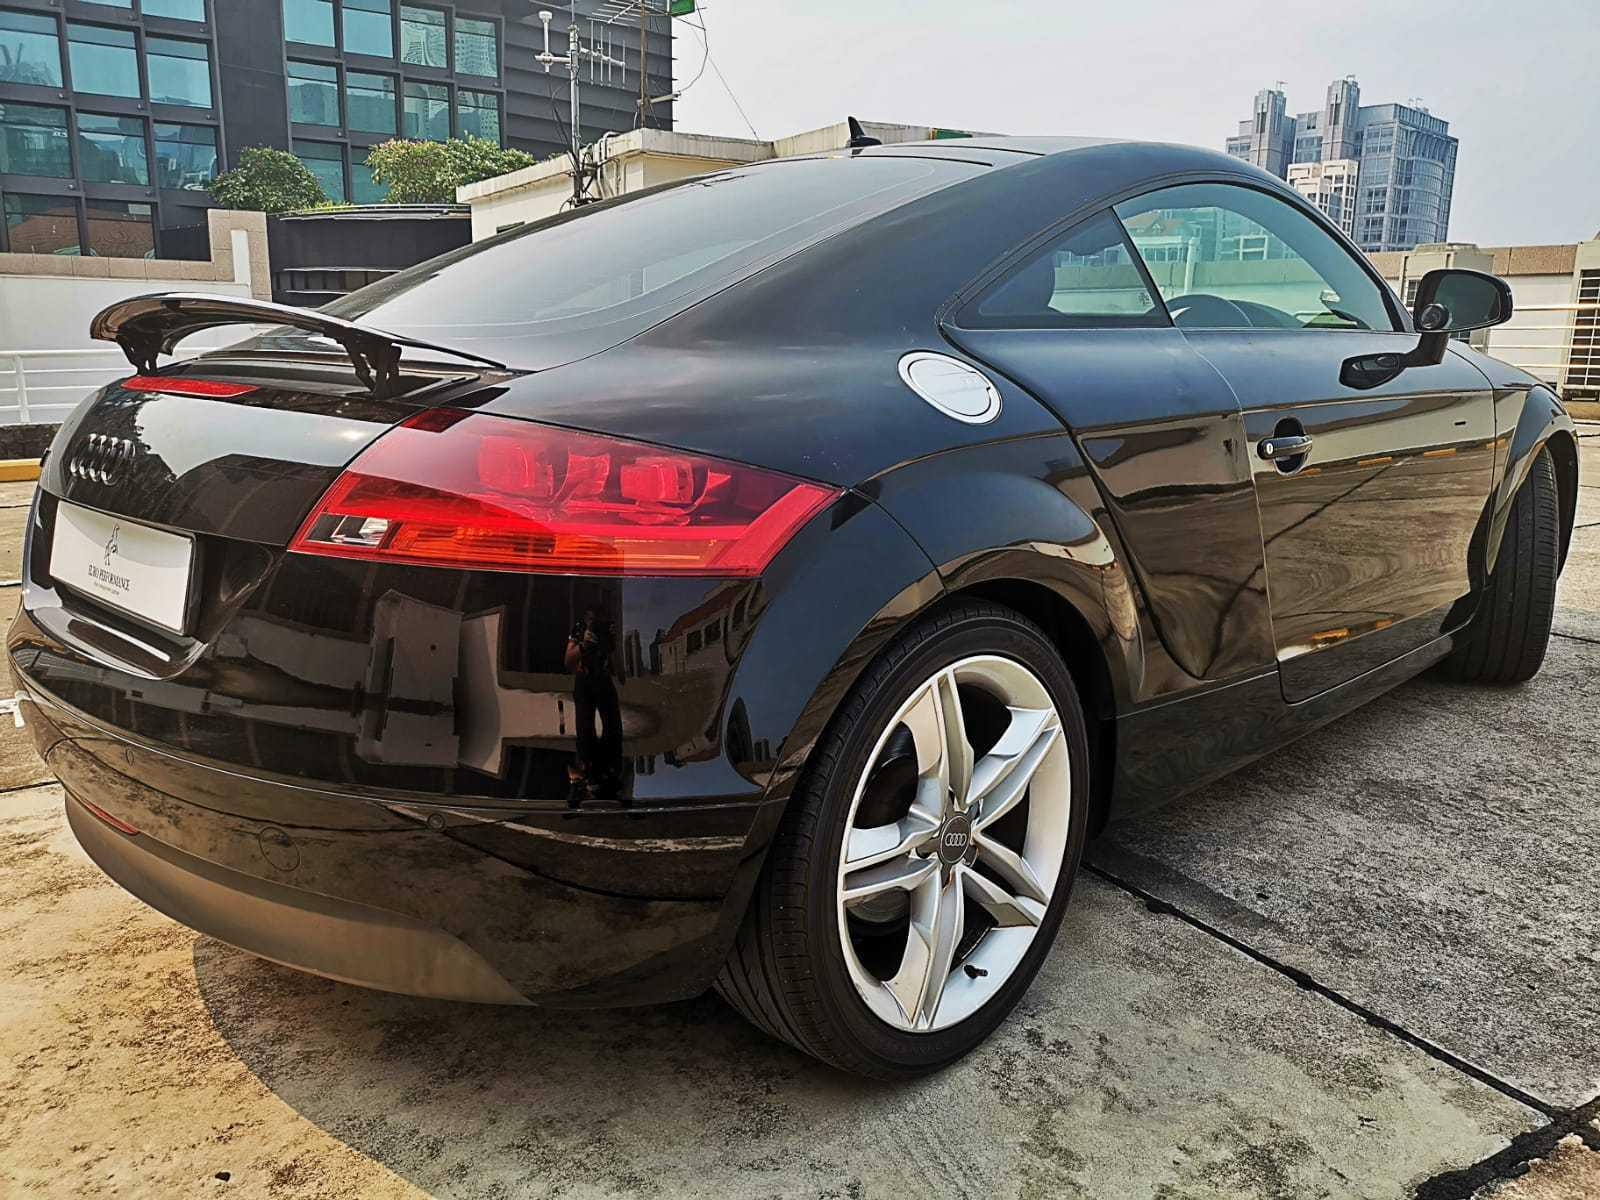 Audi TT Coupe 2.0 TFSI quattro S tronic Manual